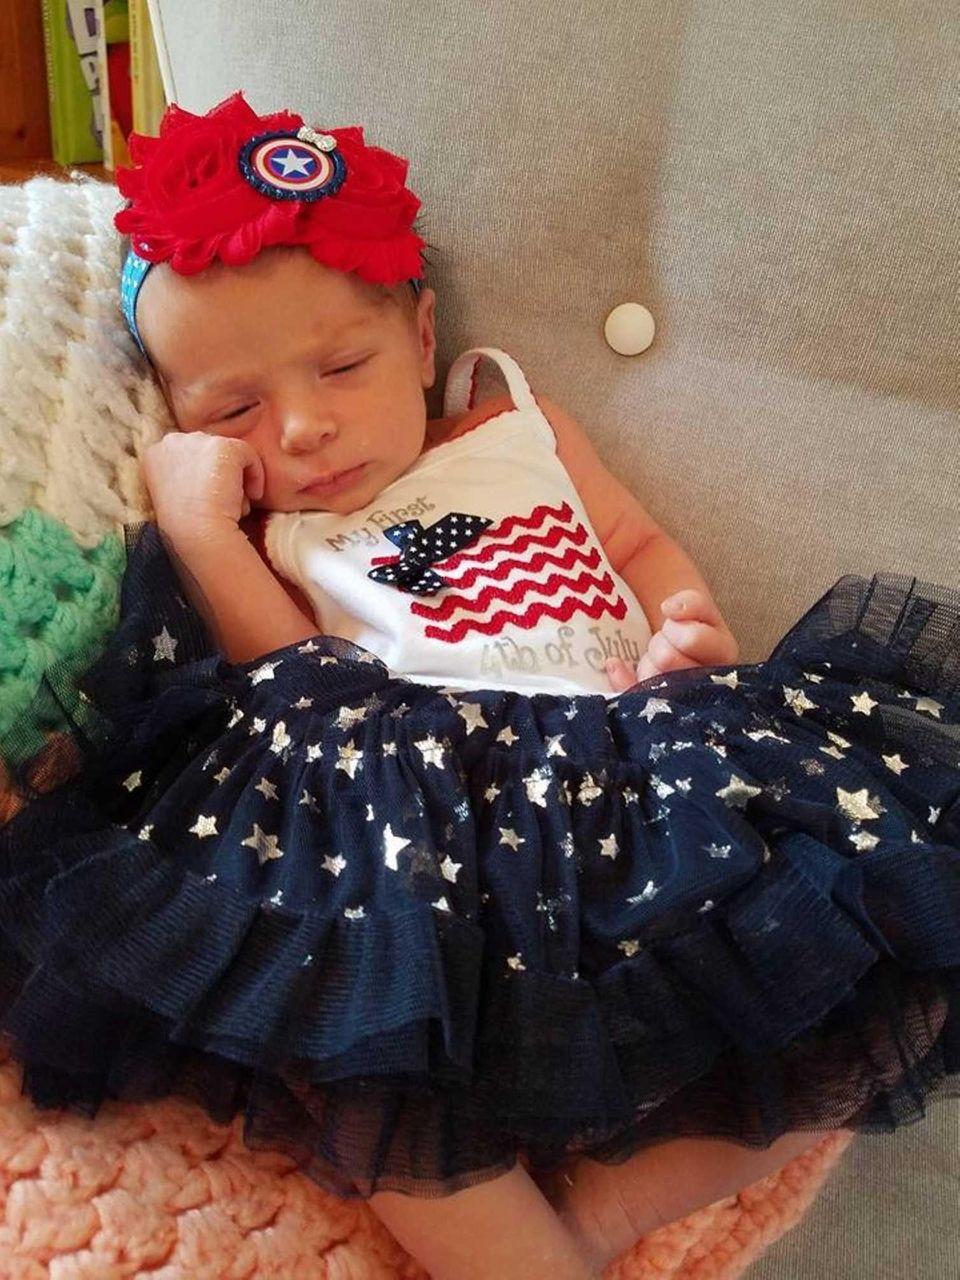 Centereach - Emily Lynn Kuveke, born 6/20/16, enthusiastically